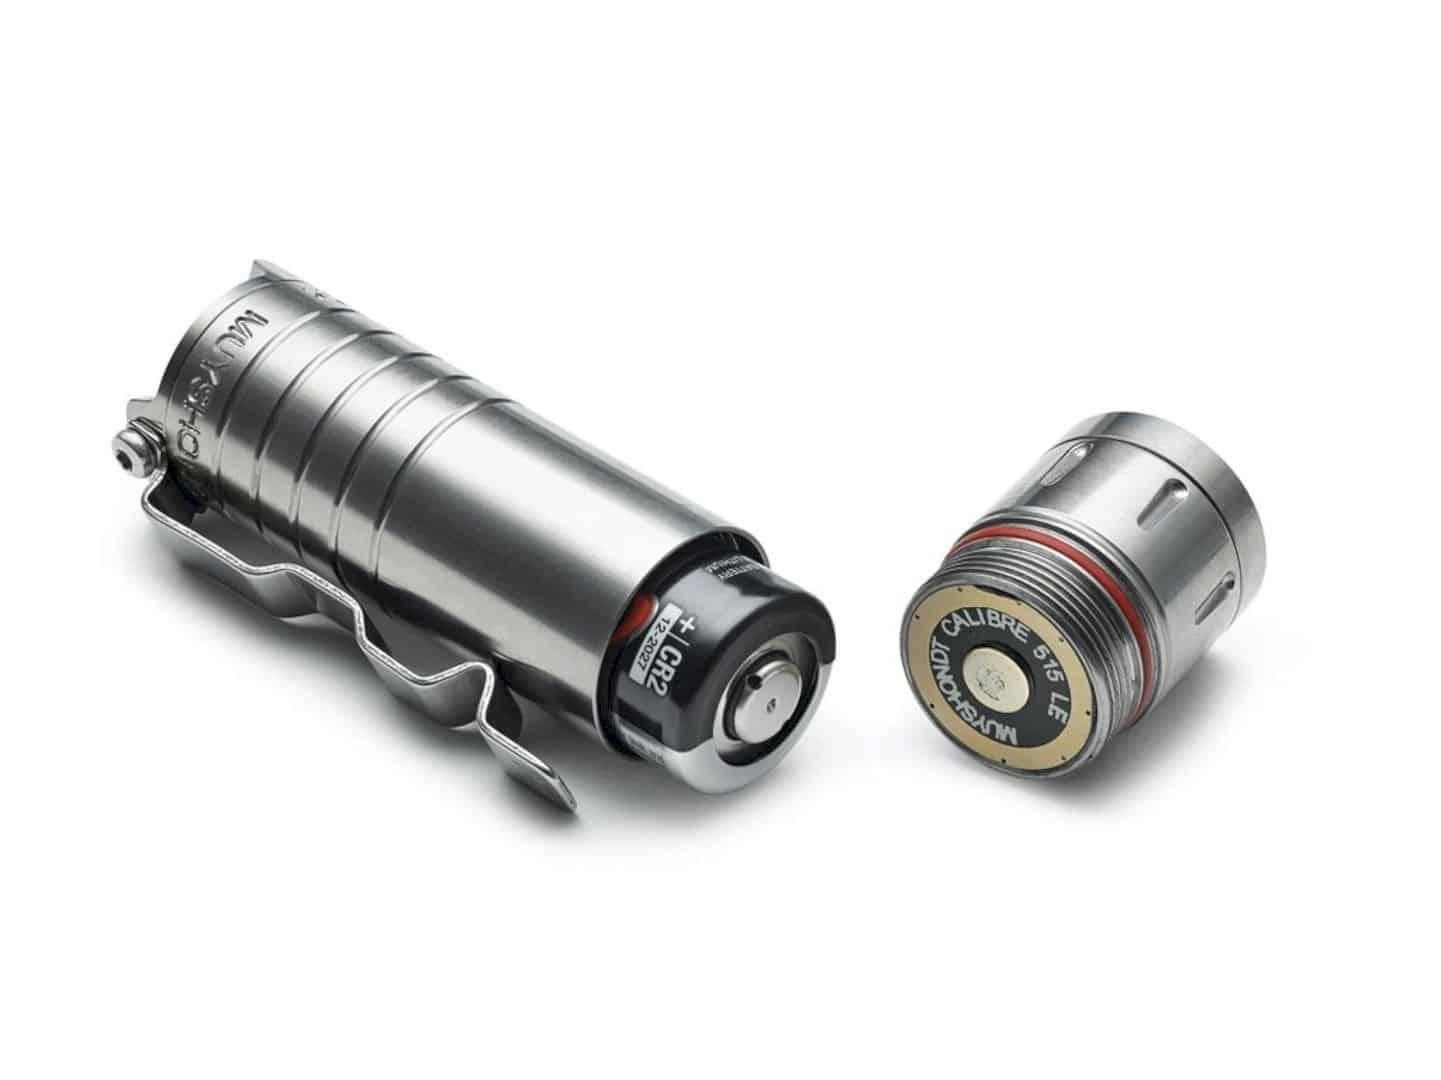 Aeon Mk Iii Electric Torch Titanium Series 2 2